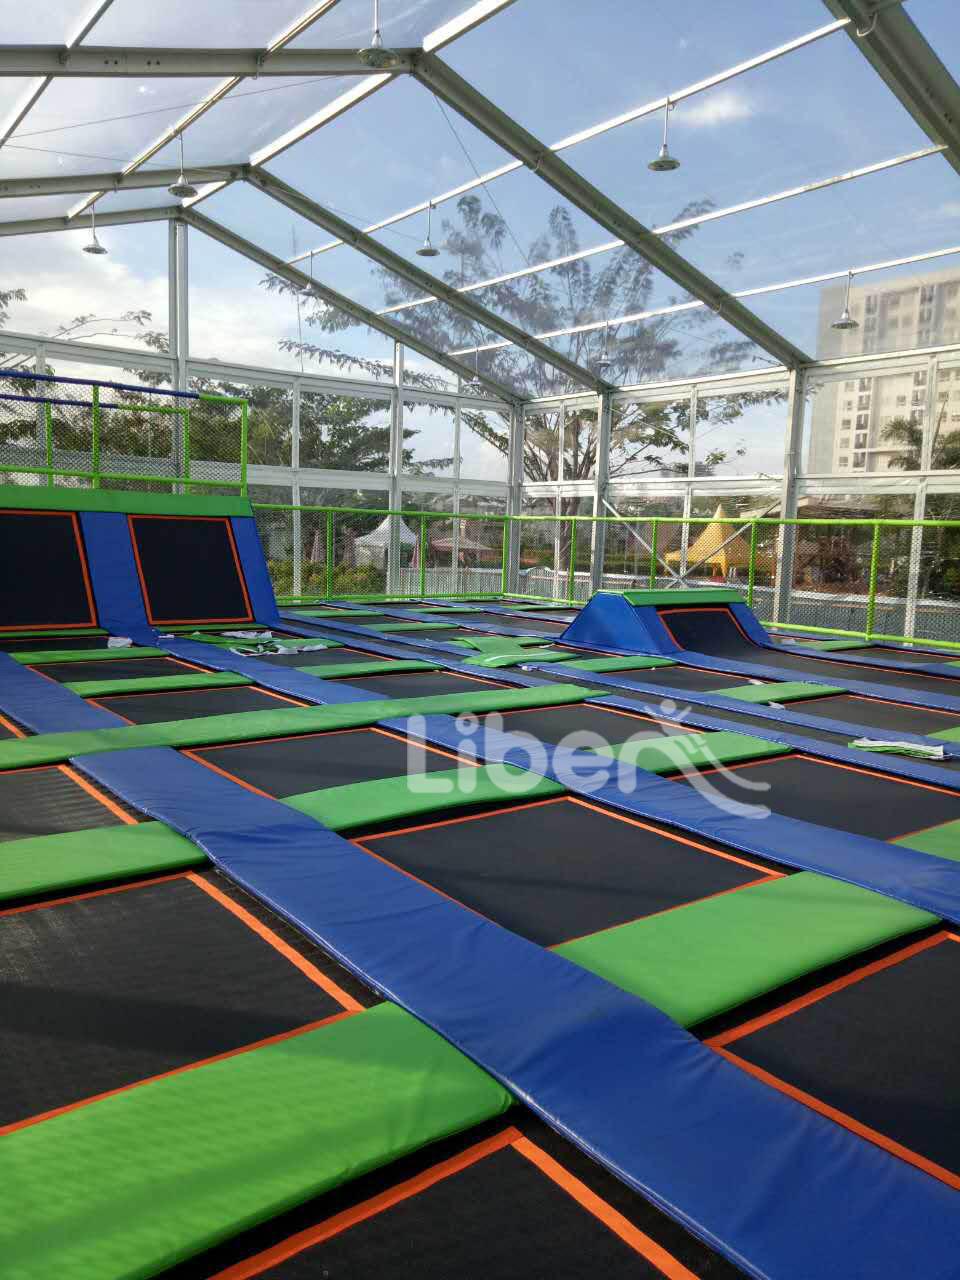 outdoor trampoline park manfacturer